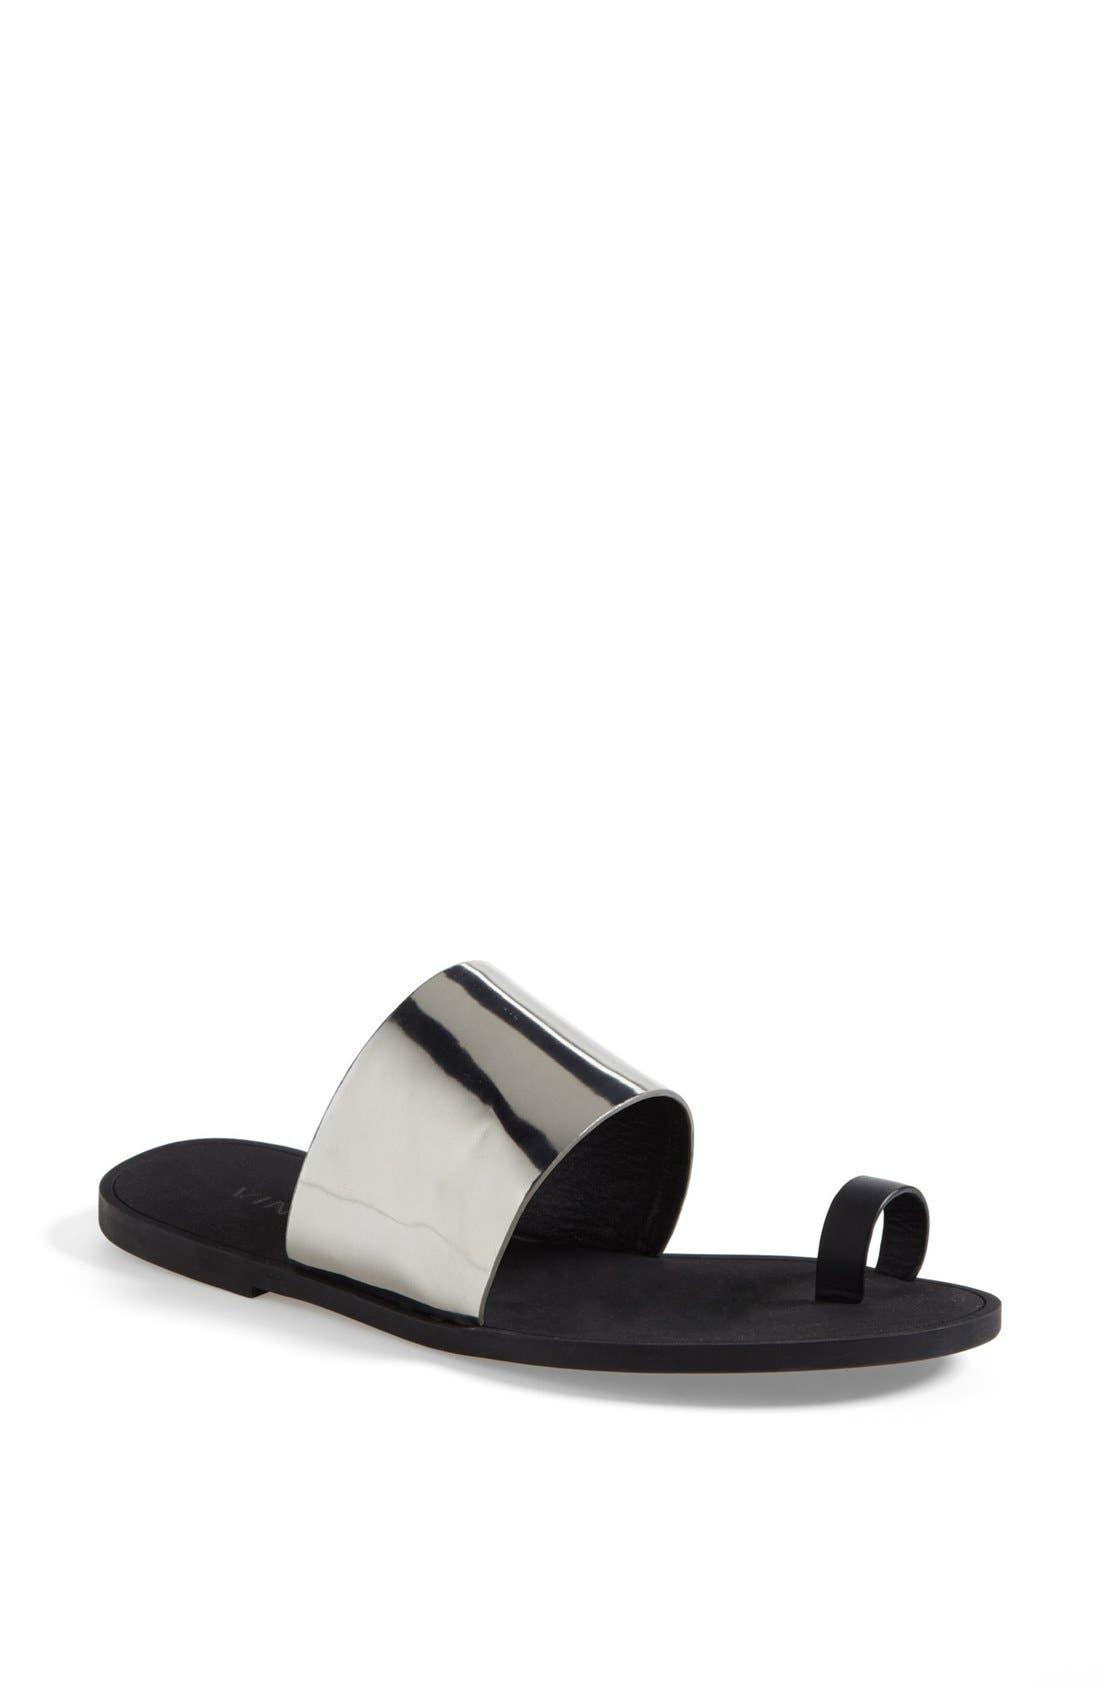 Alternate Image 1 Selected - Vince 'Sandrine' Sandal